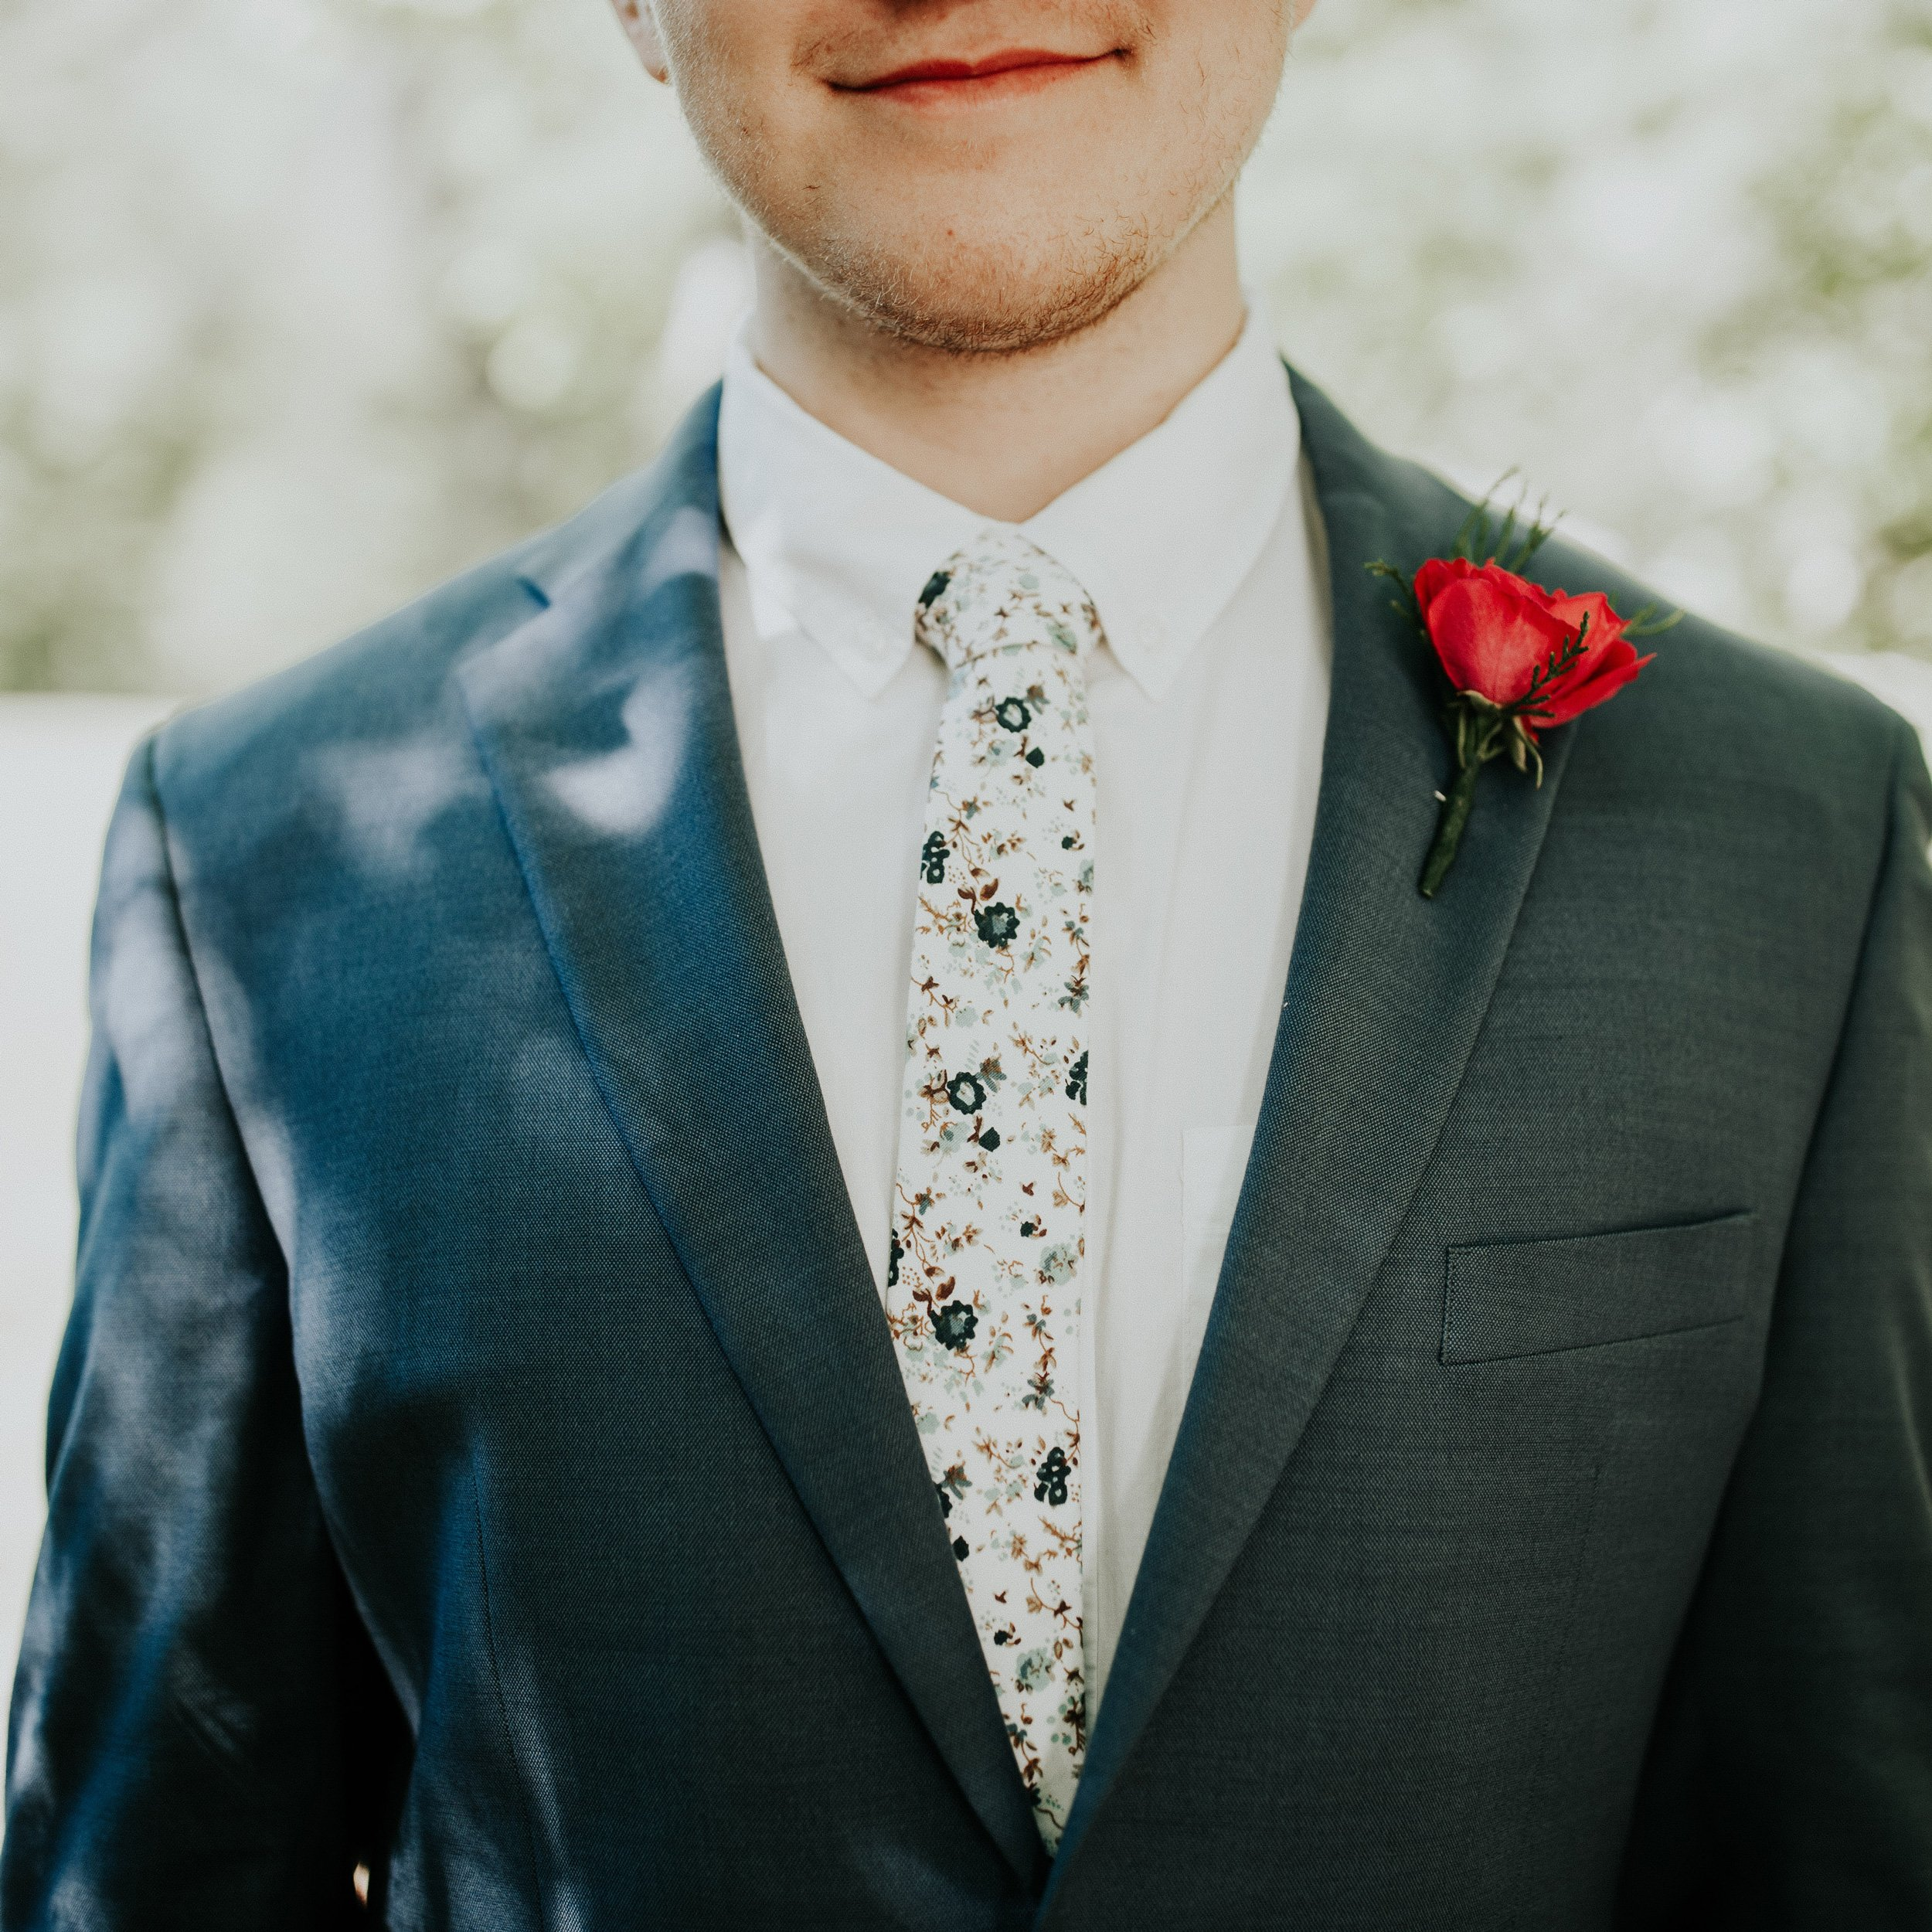 DAZI Men's Skinny Tie Floral Print Cotton Necktie, Great for Weddings, Groom, Groomsmen, Missions, Dances, Gifts. (Blue Bloom) by DAZI (Image #4)